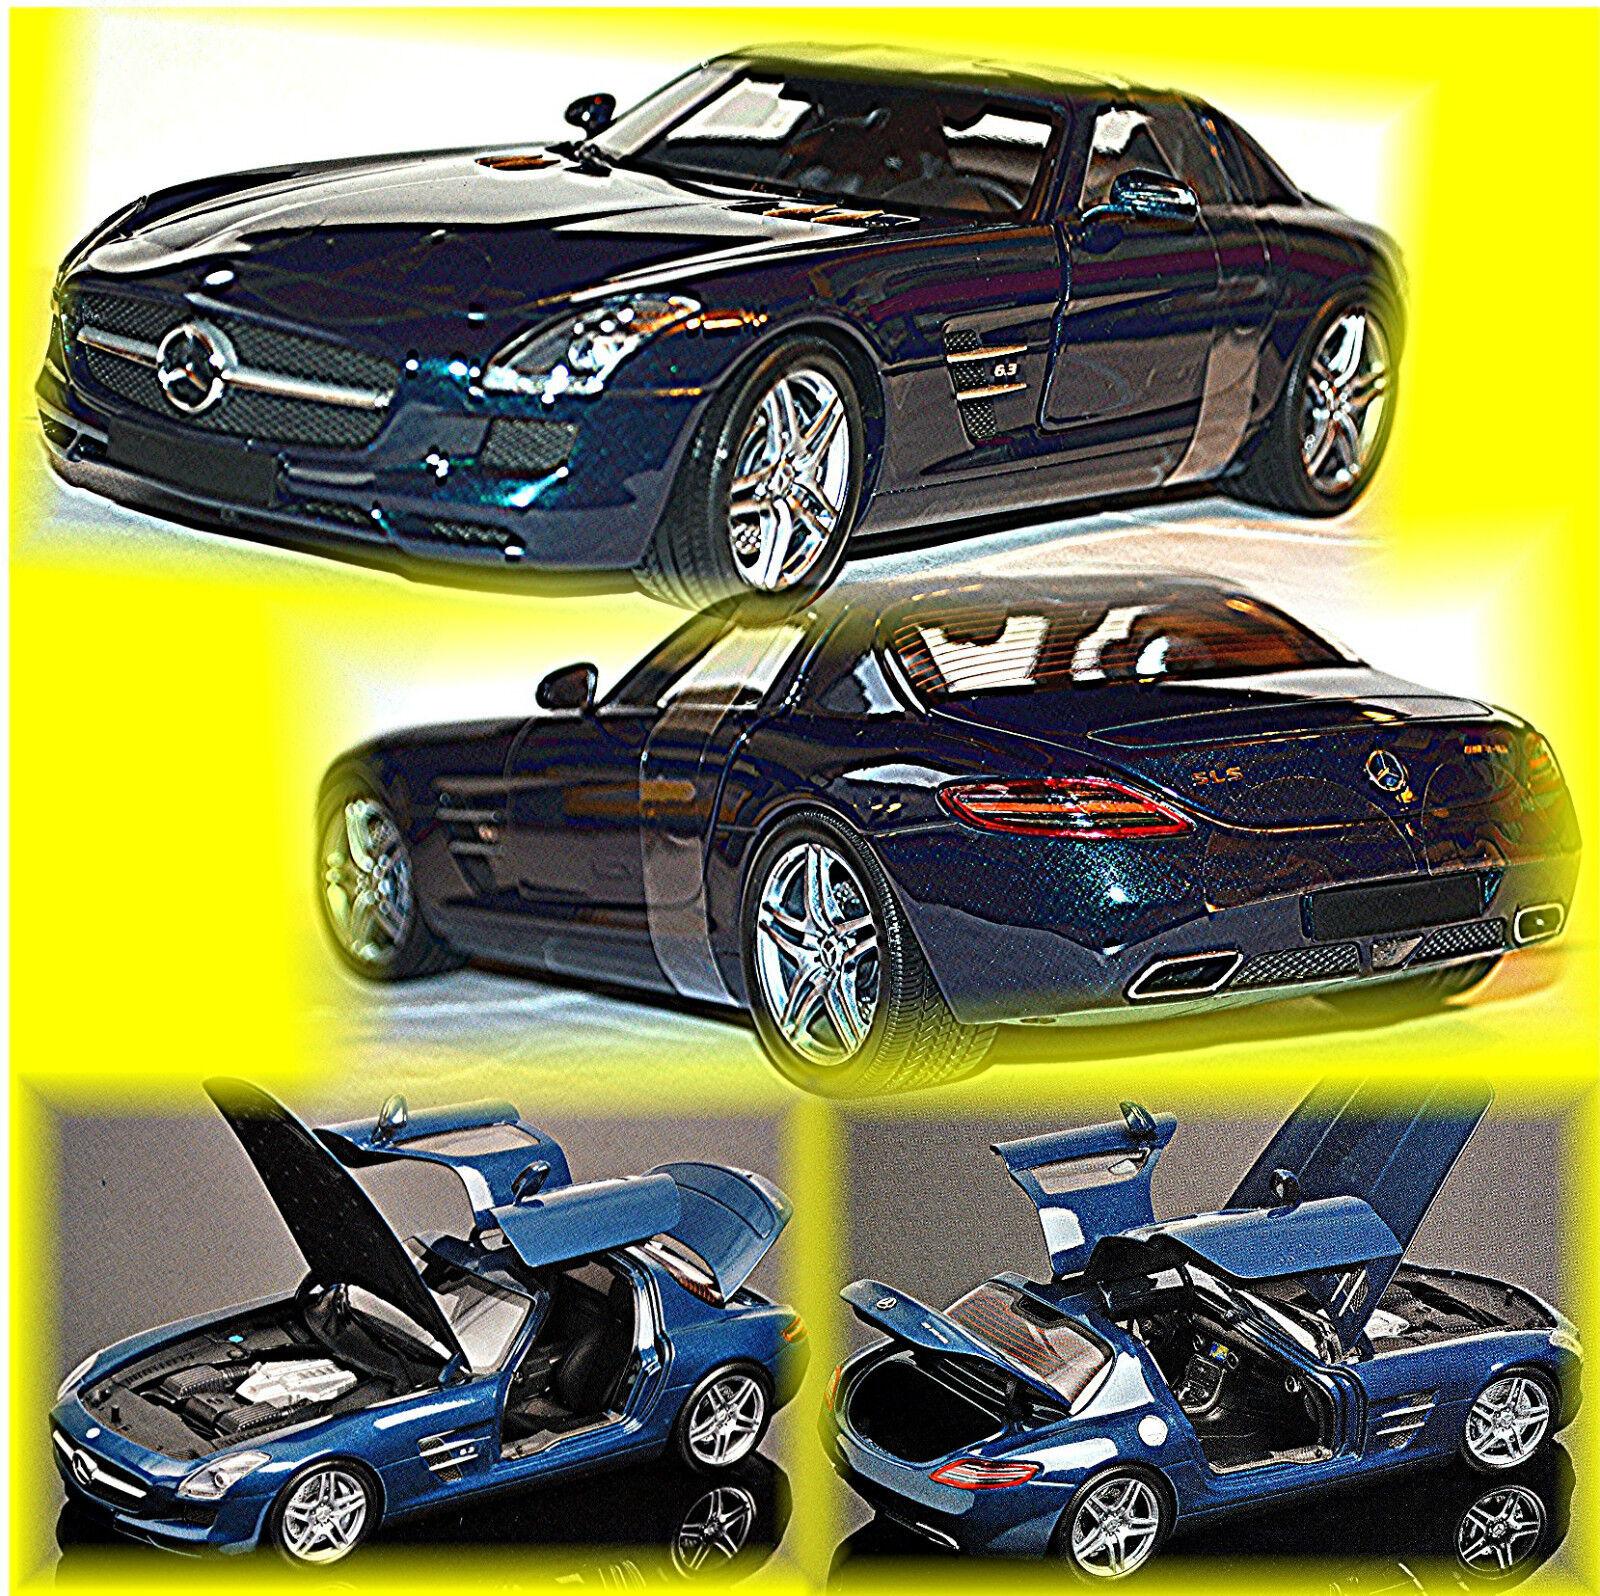 Mercedes Benz SLS AMG Coupe bluee Metallic 1 18 Minichamps